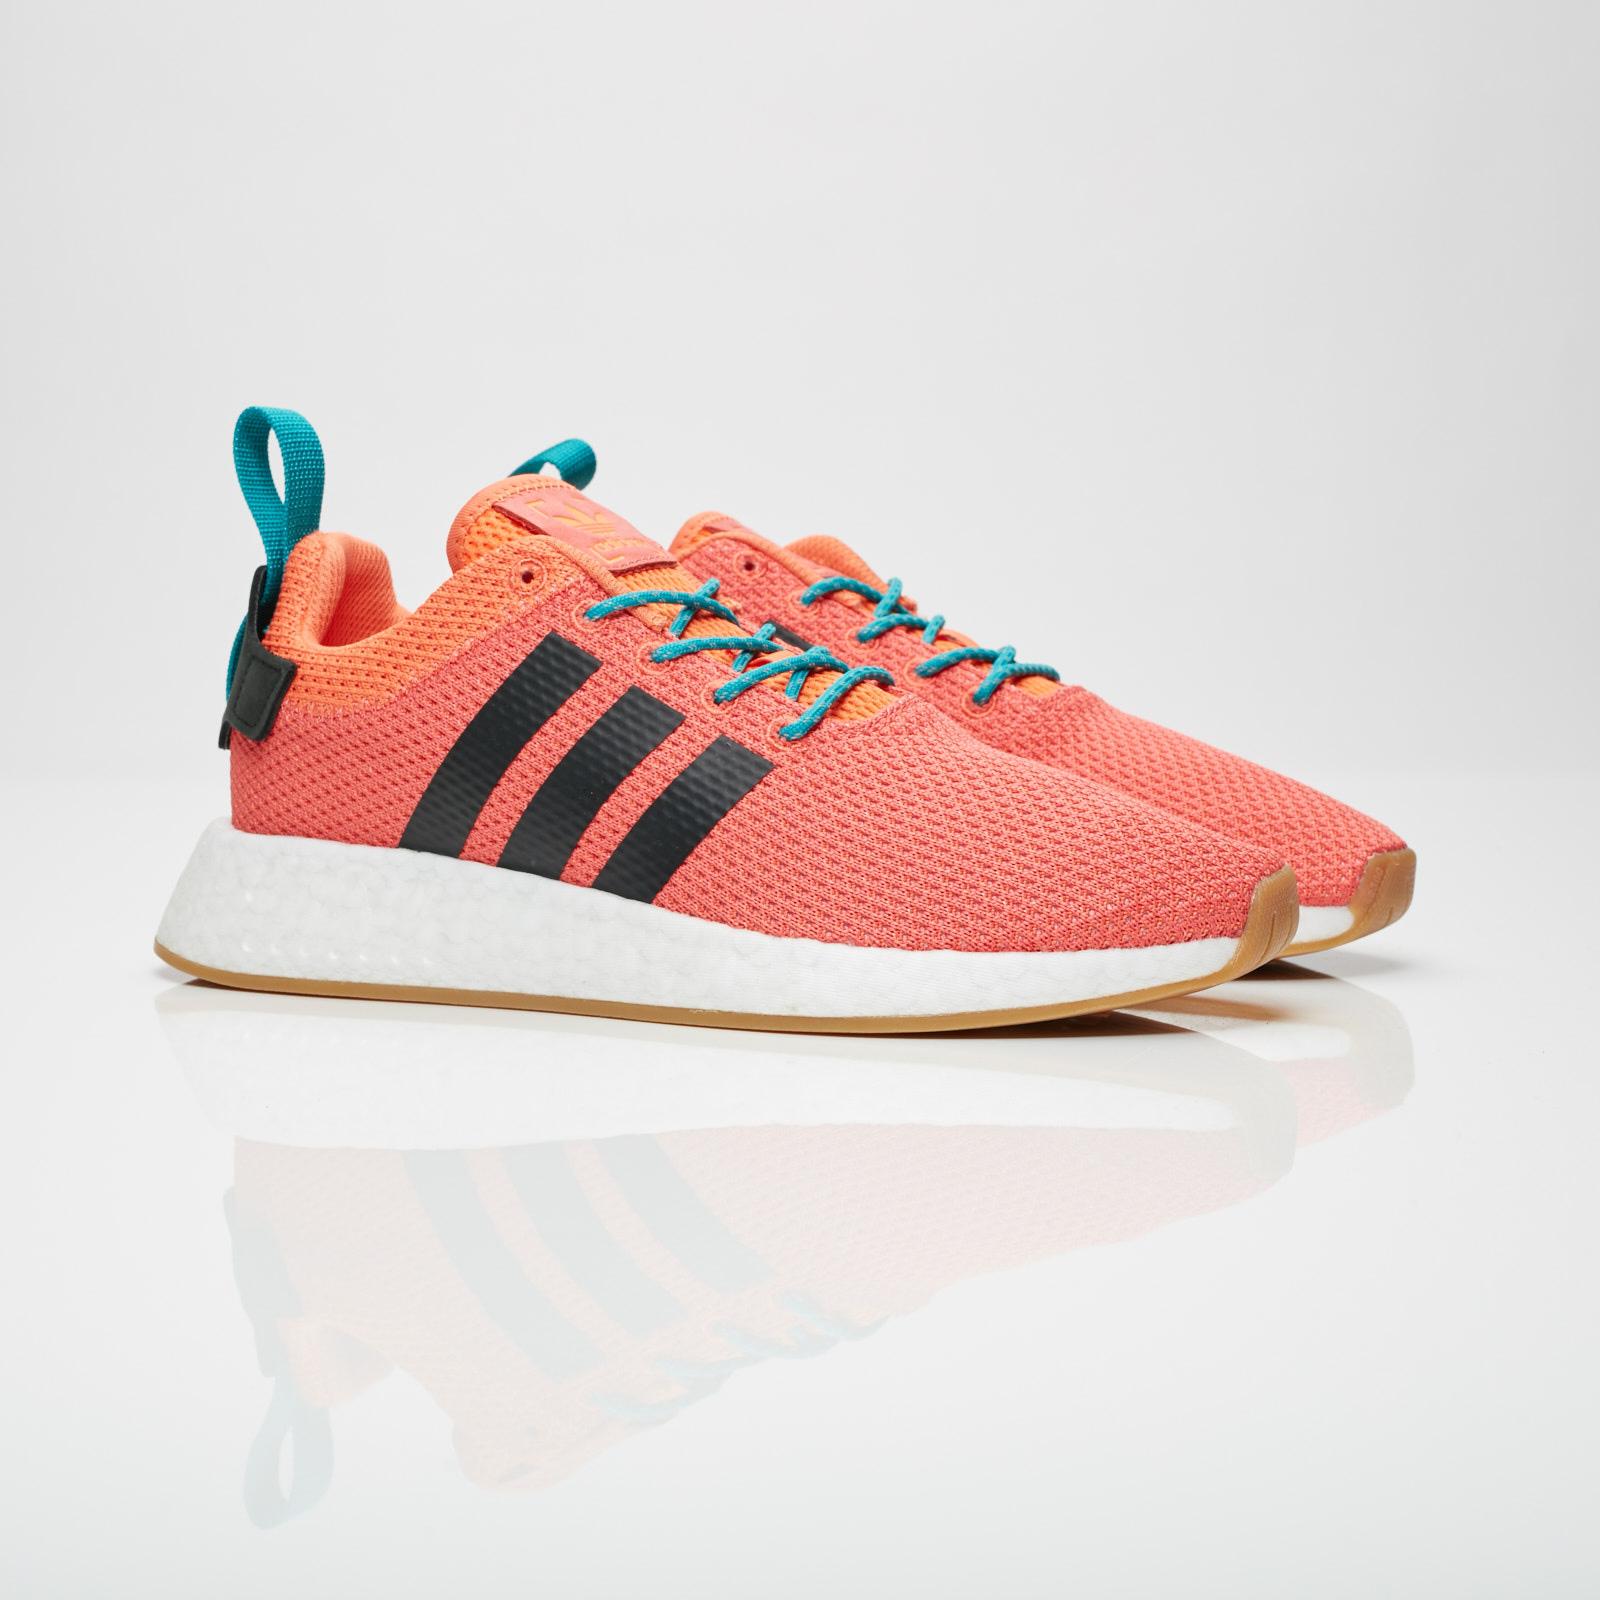 Adidas Nmd R2 Summer Cq3081 Sneakersnstuff Sneakers Streetwear Online Since 1999